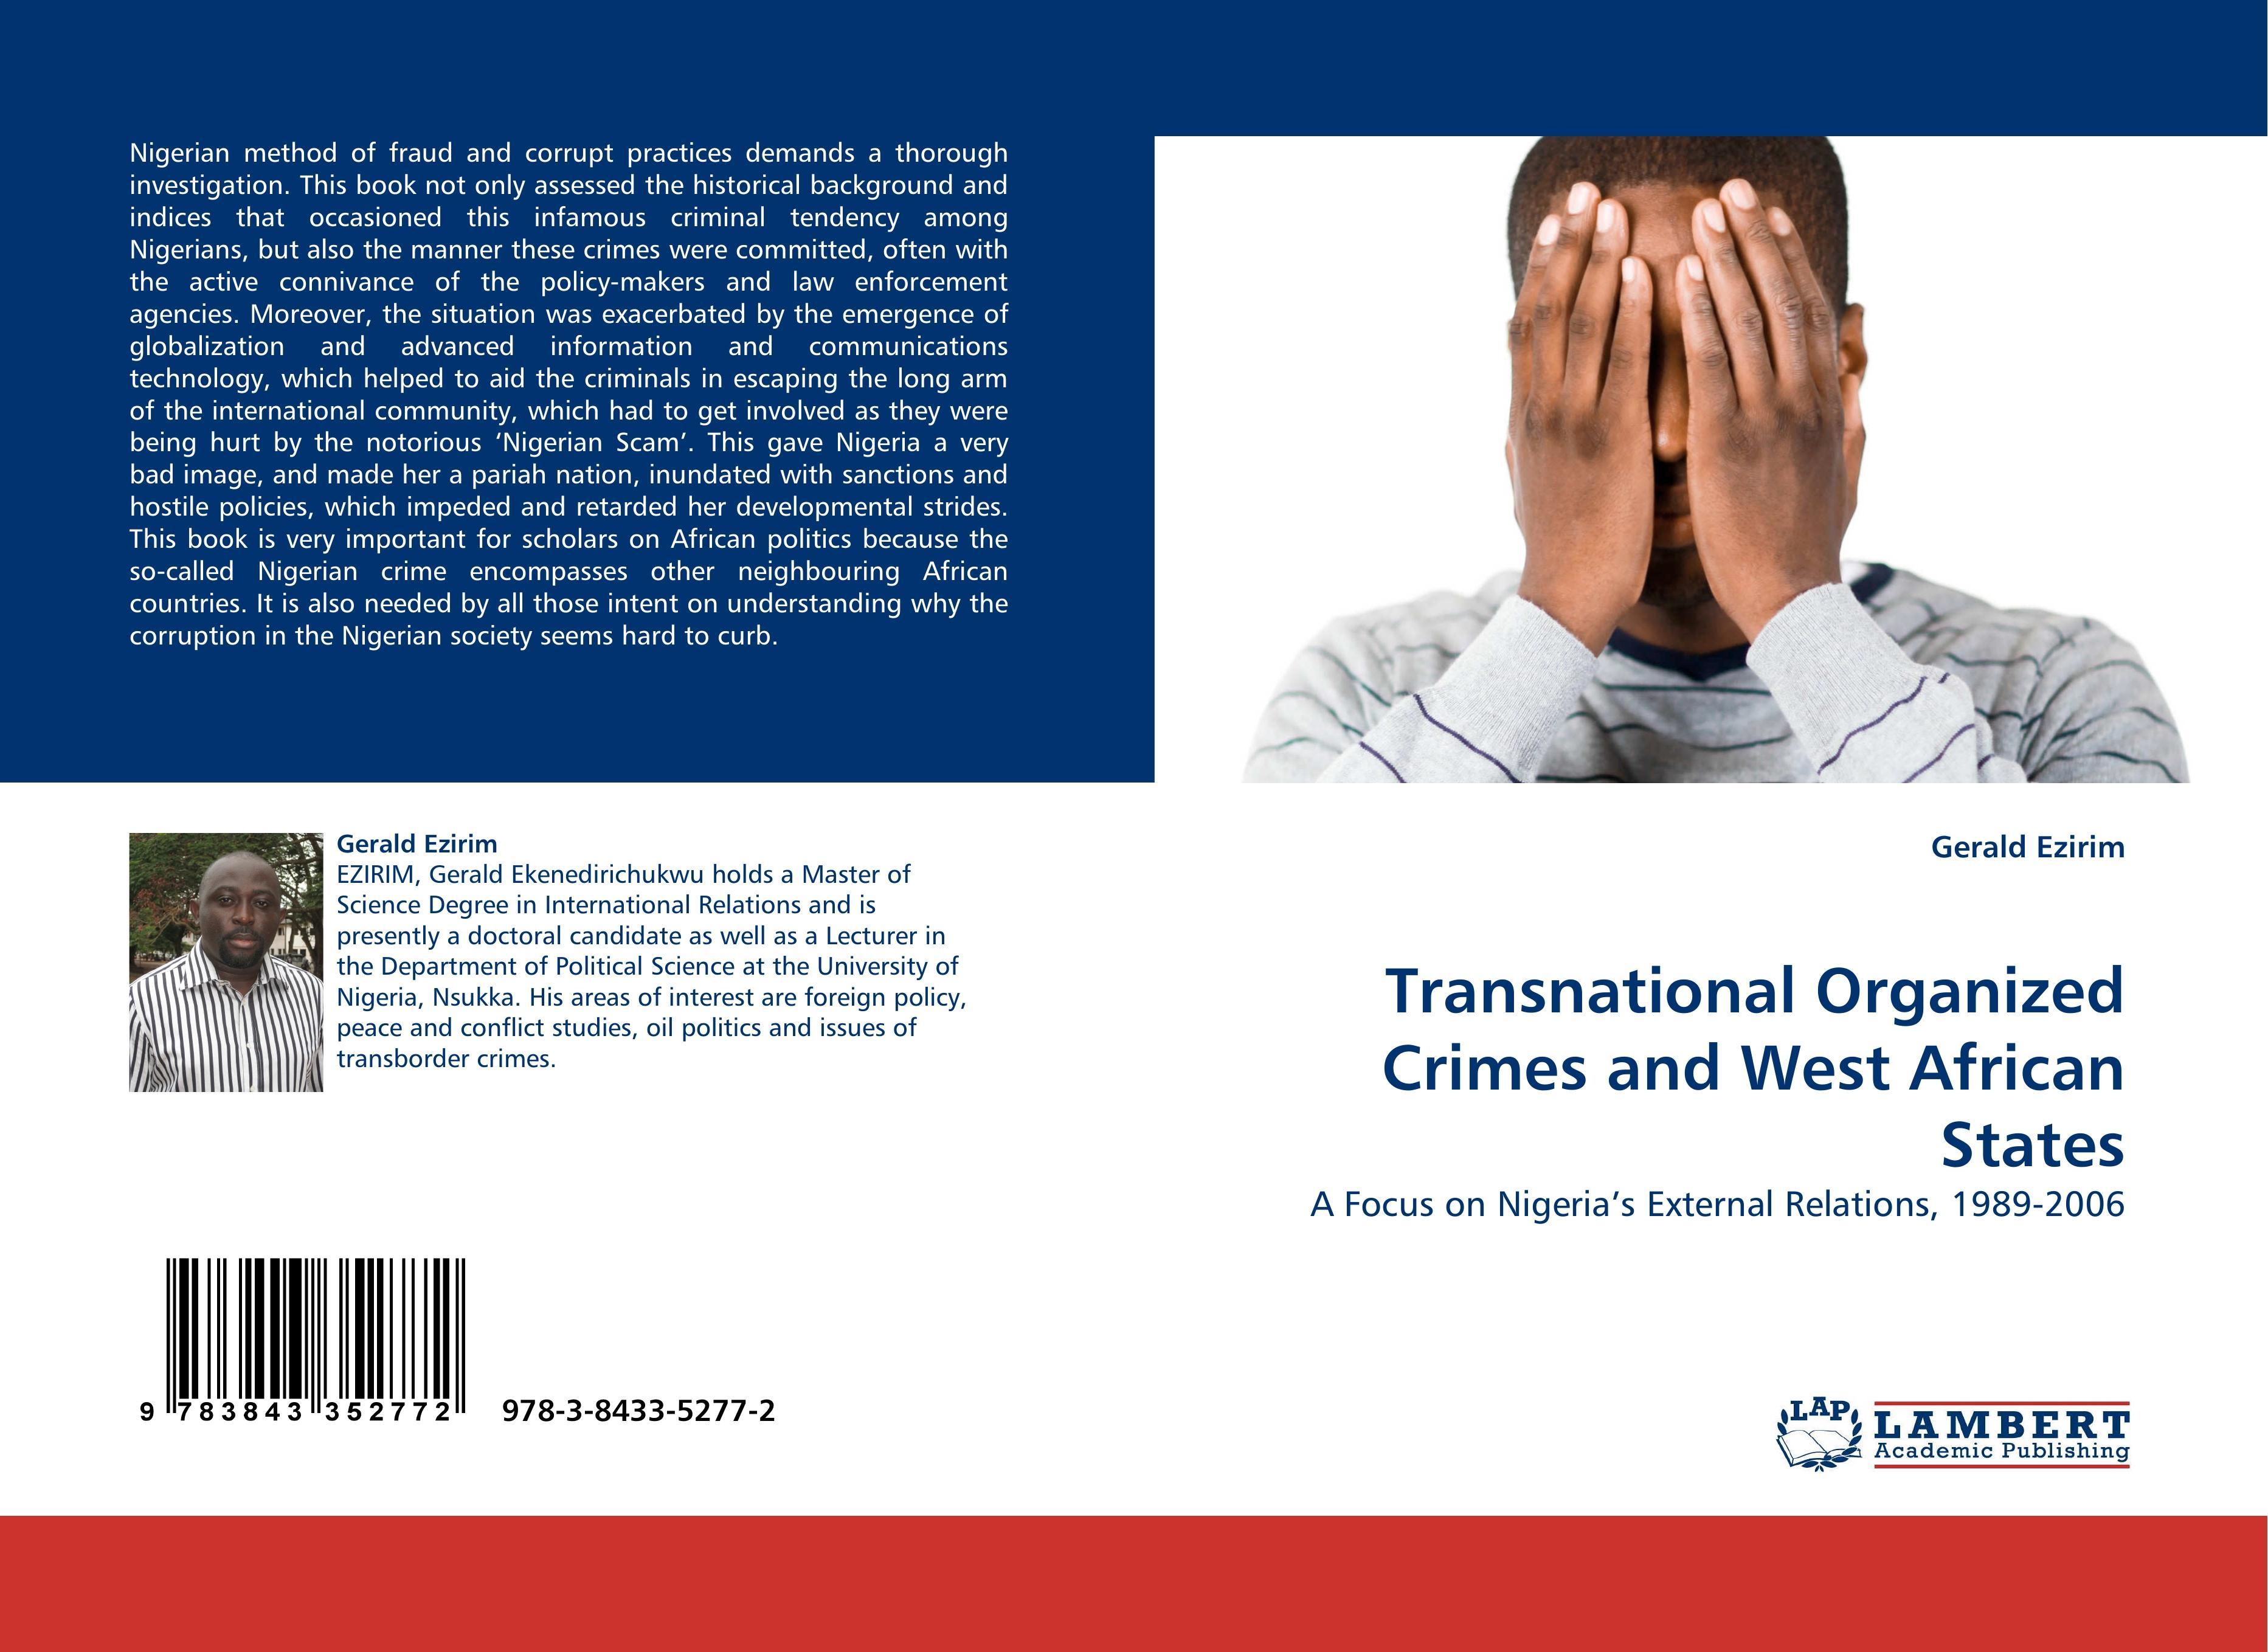 Transnational Organized Crimes and West African States  A Focus on Nigeria's External Relations, 1989-2006  Gerald Ezirim  Taschenbuch  Paperback  Englisch  2010 - Ezirim, Gerald